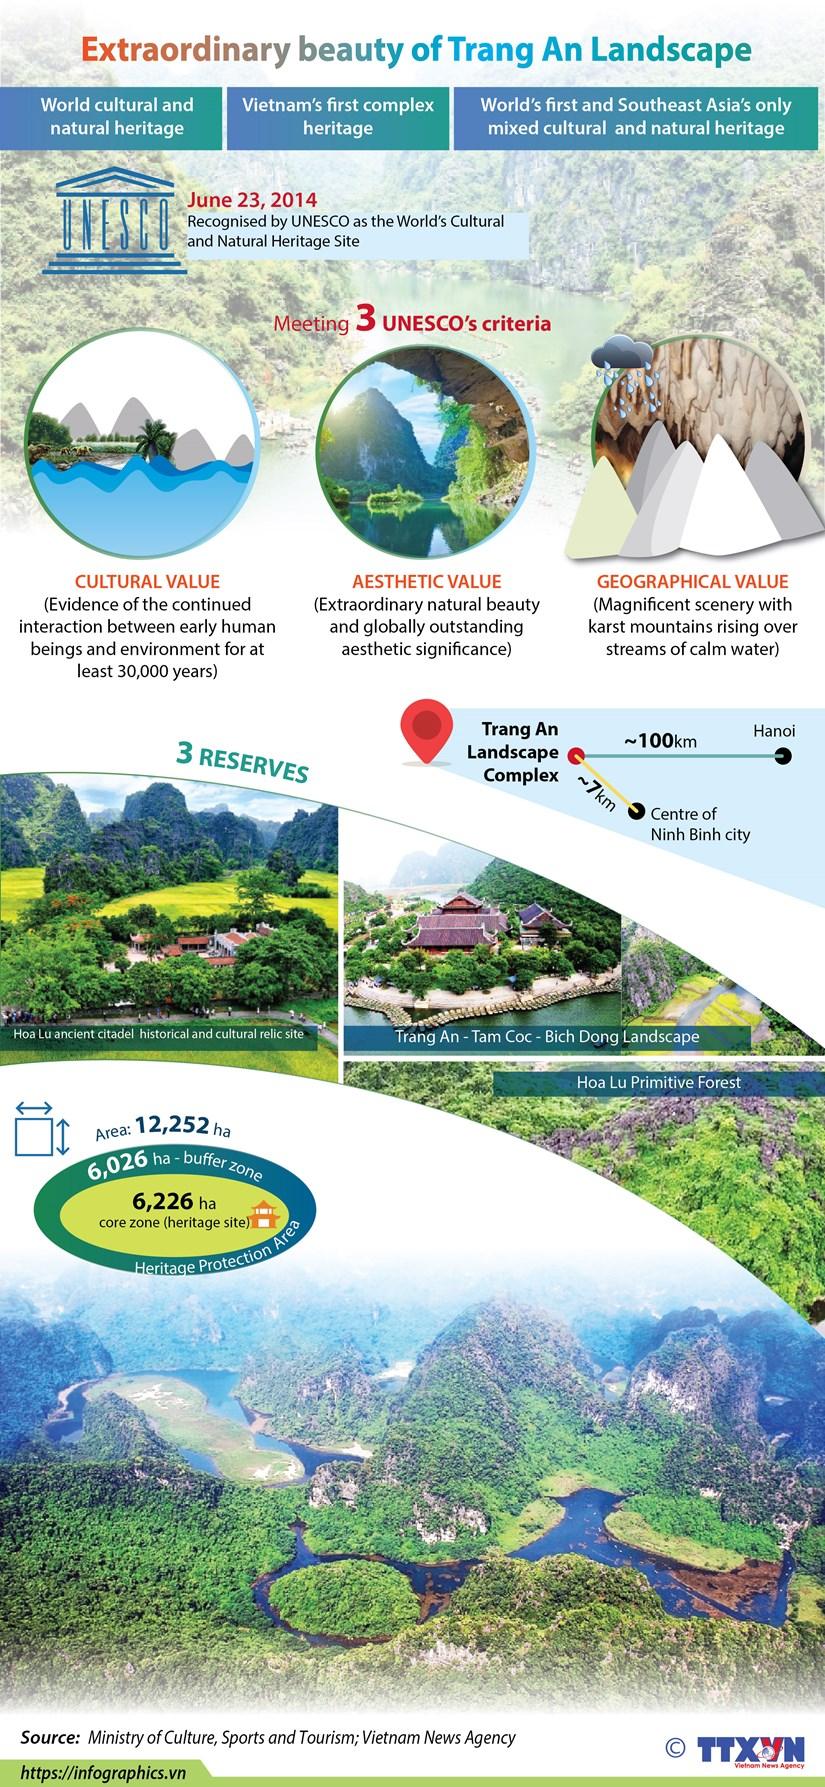 Extraordinary beauty of Trang An Landscape hinh anh 1